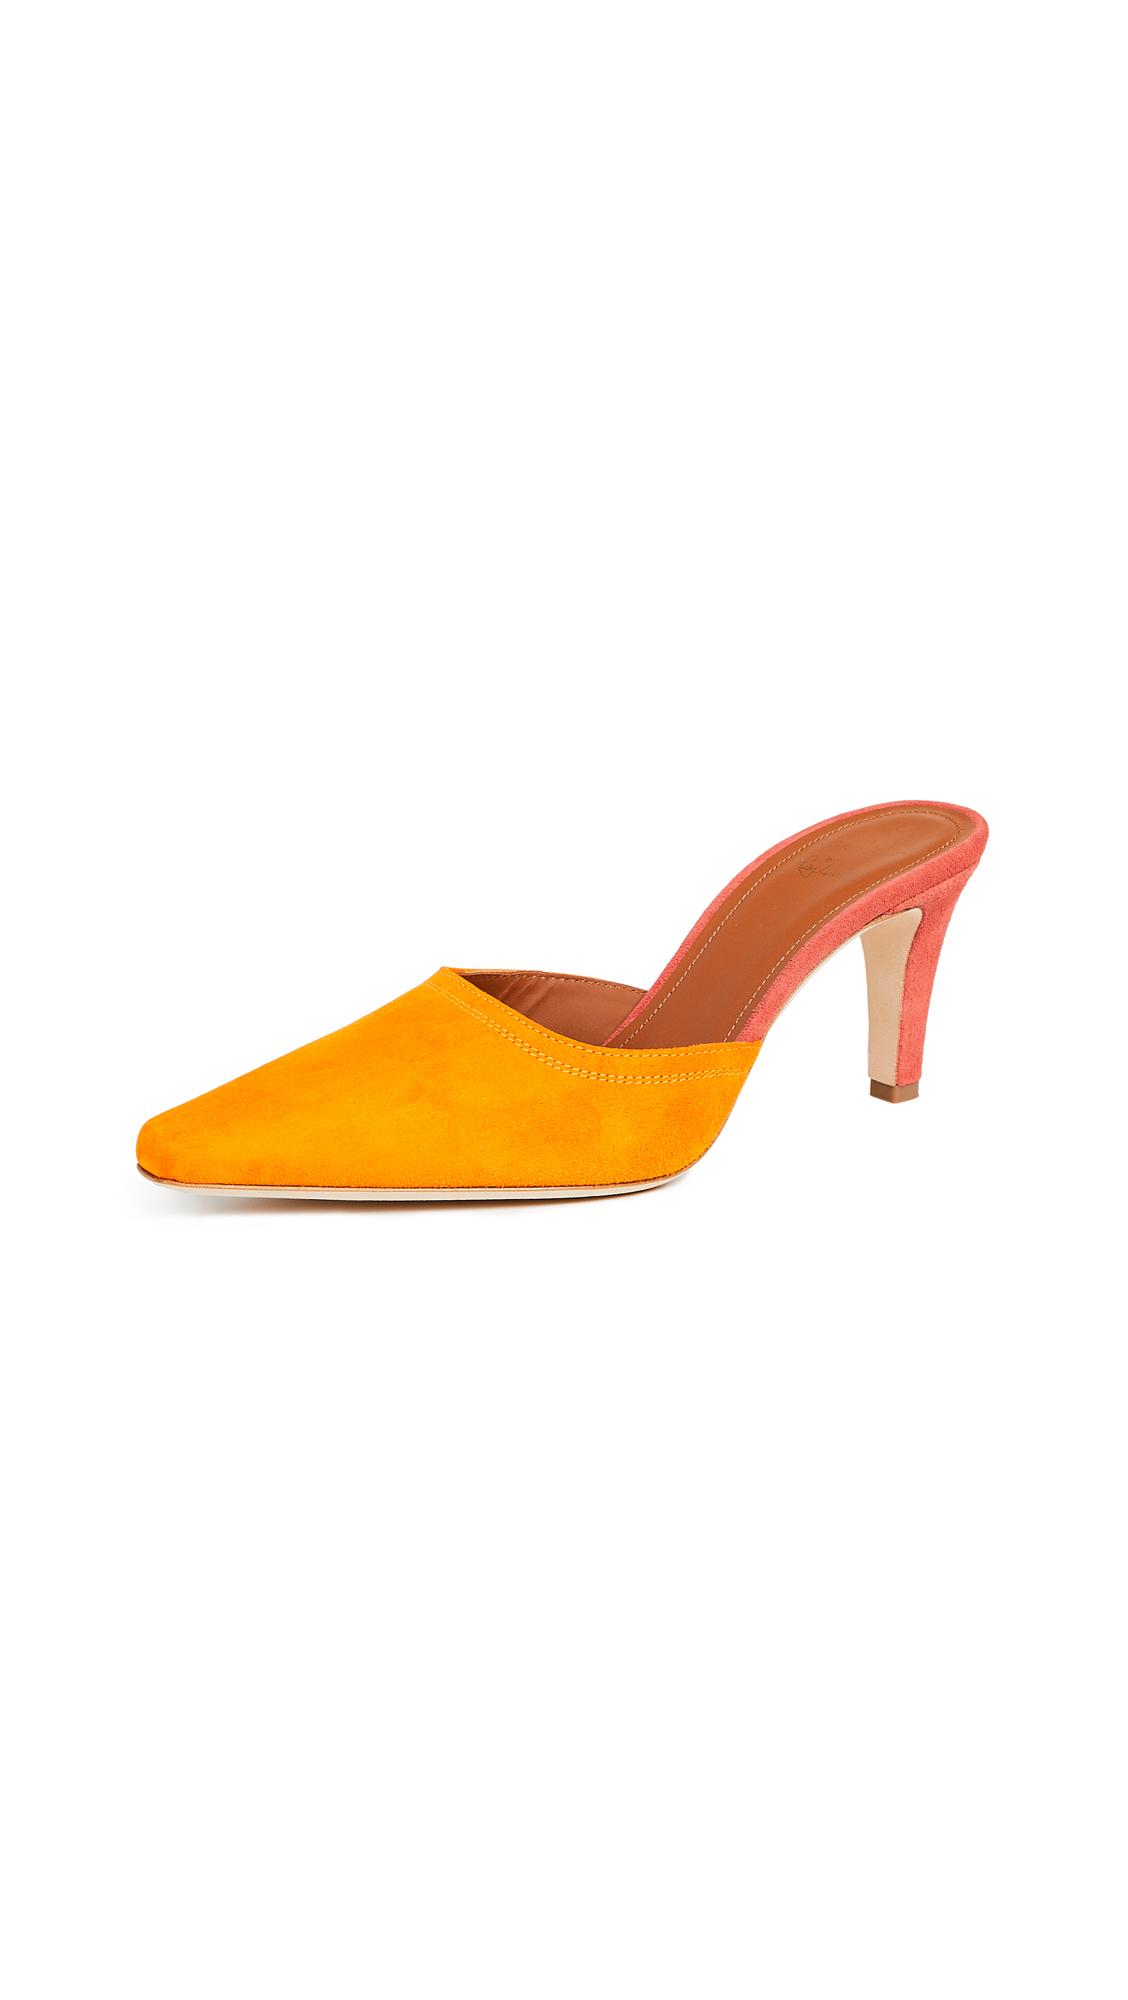 Malone Souliers Riona Roksanda Mules - Orange/Grapefruit